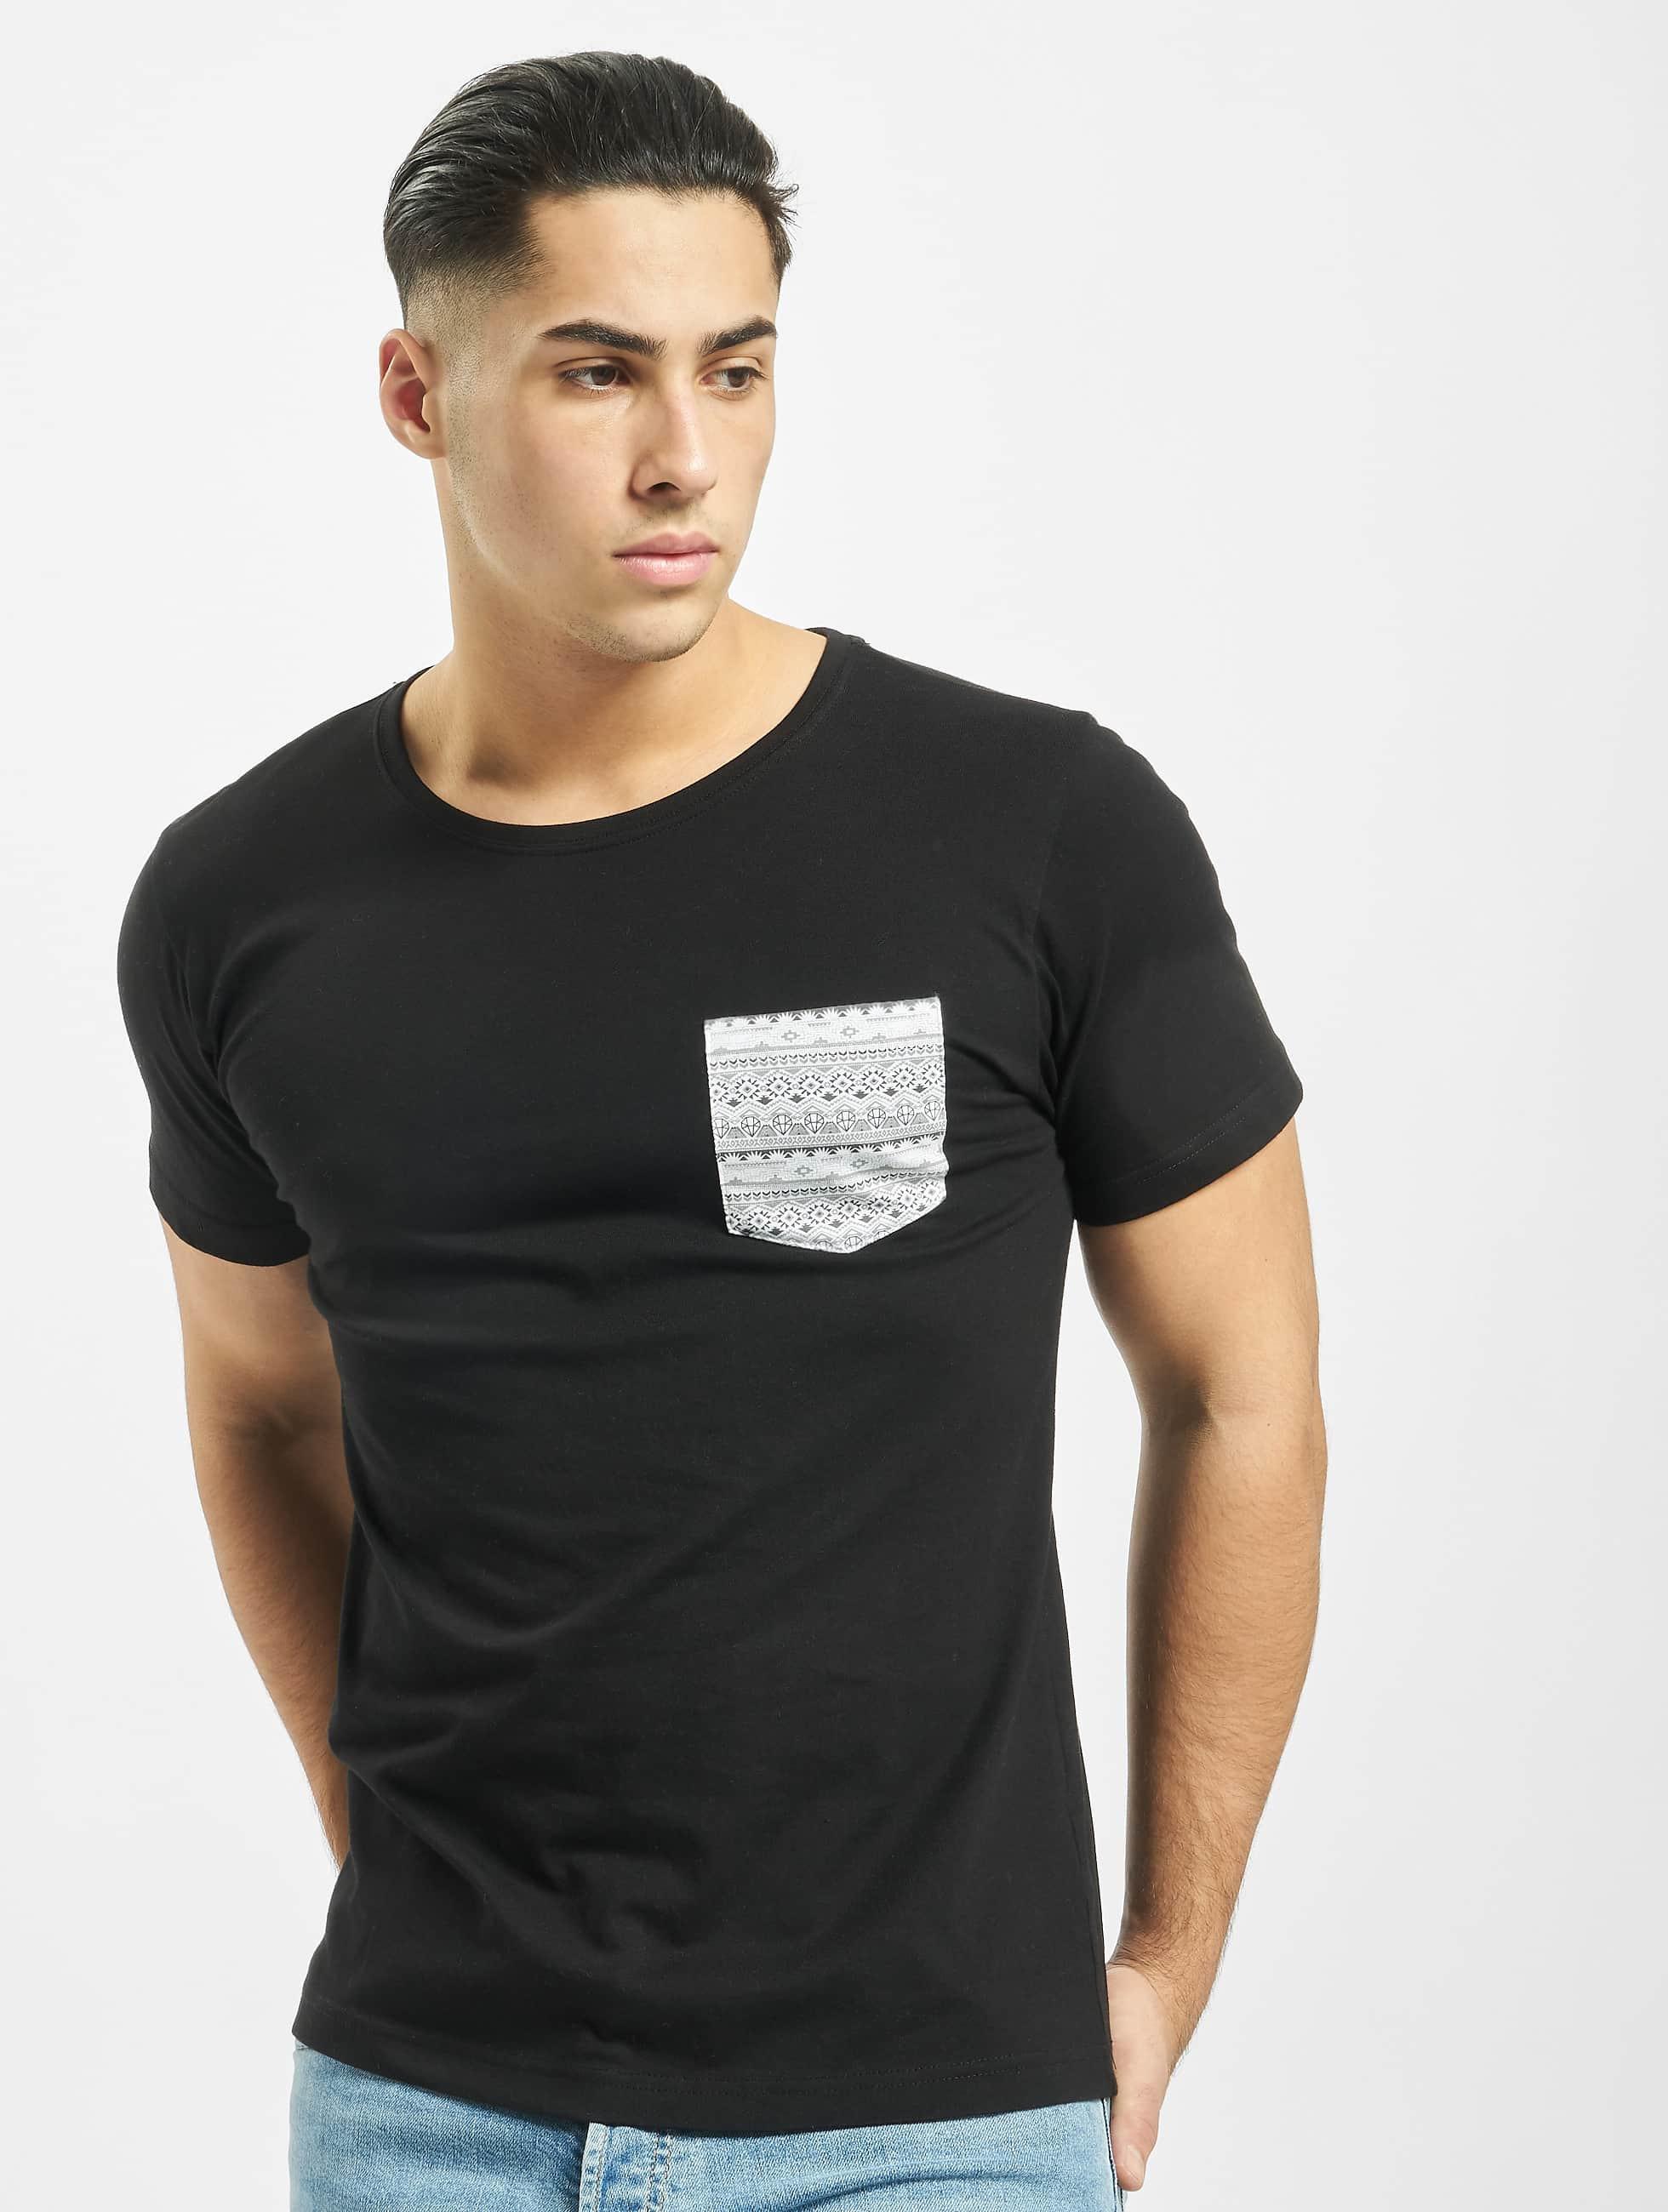 Urban Classics Contrast Pocket noir T-Shirt homme